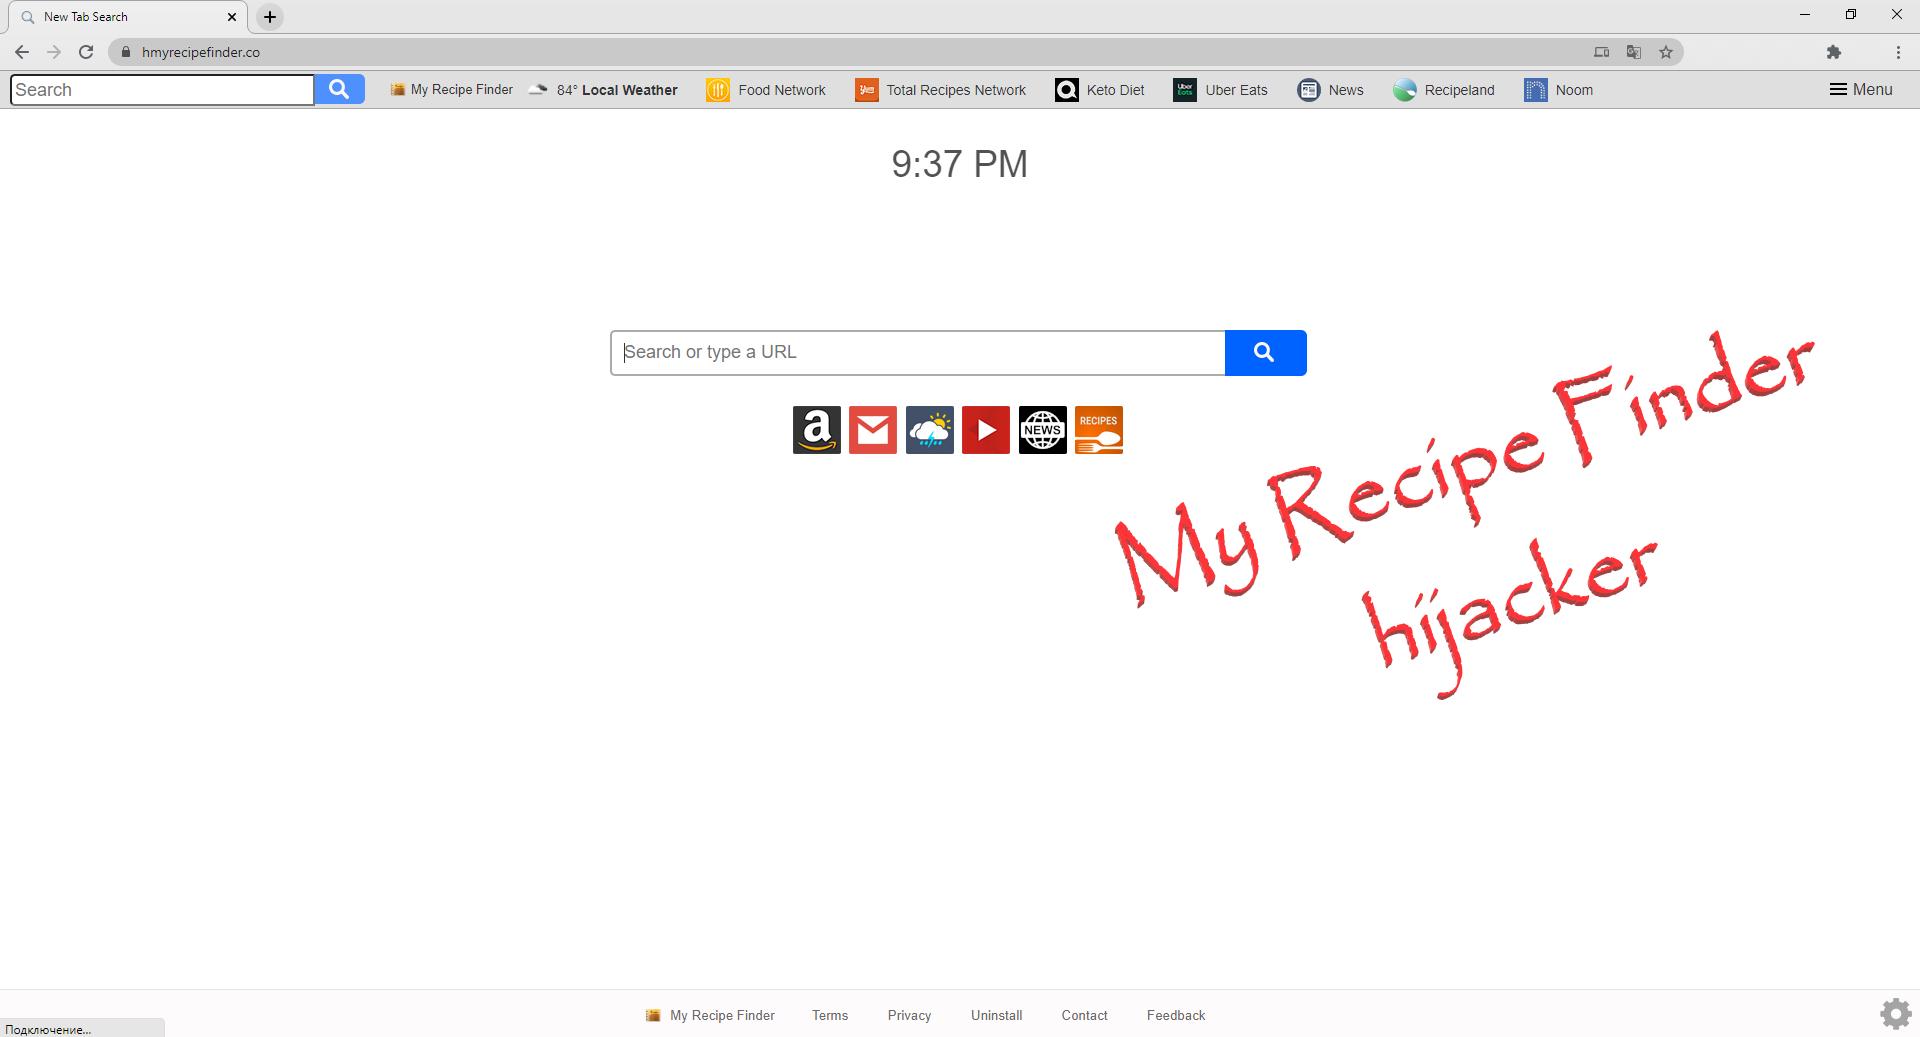 remover a pesquisa do My Recipe Finder